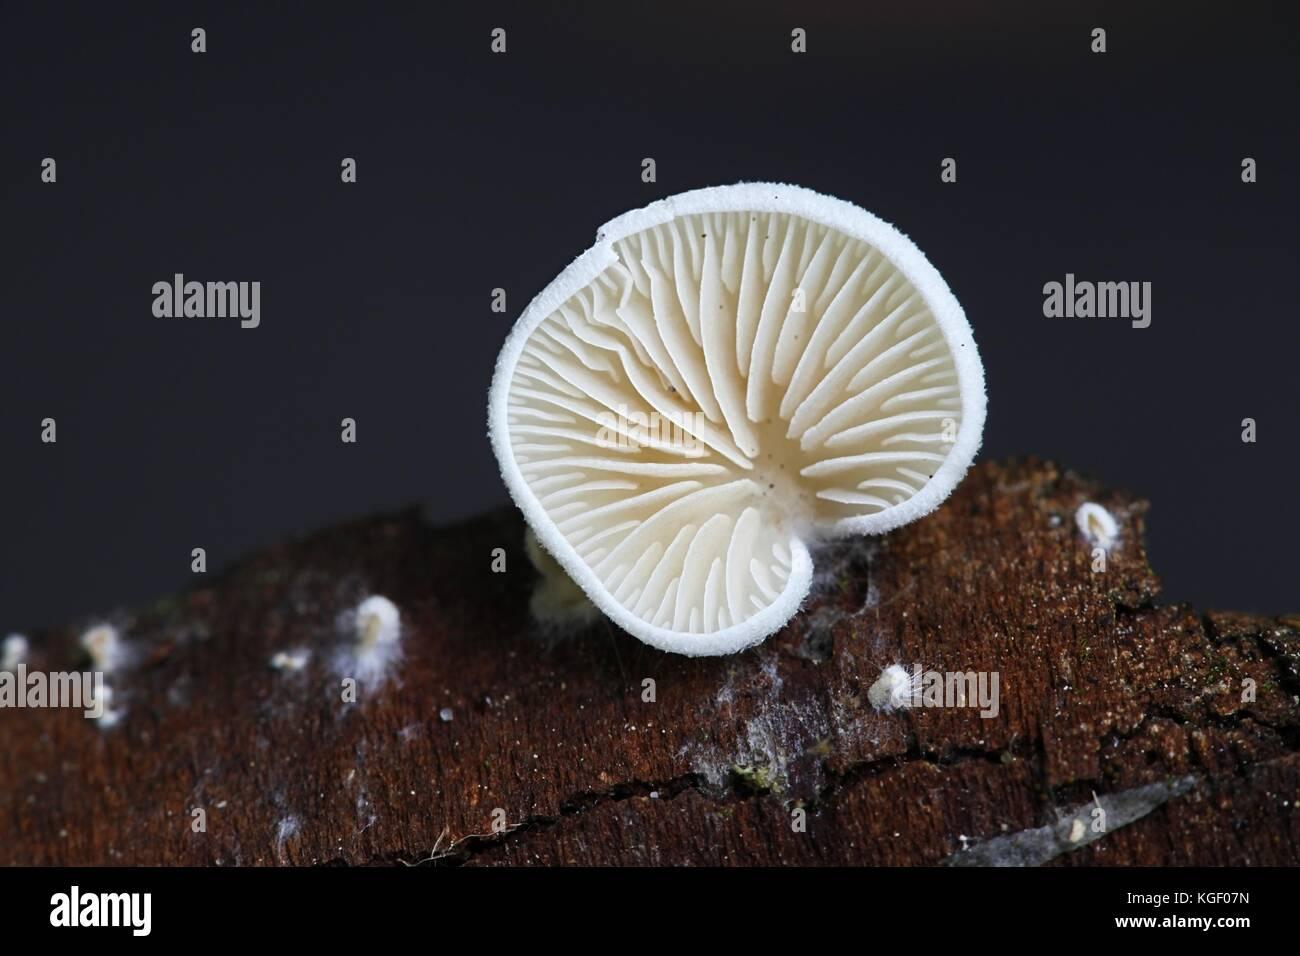 Evasive agaric mushroom, Crepidotus versutus - Stock Image